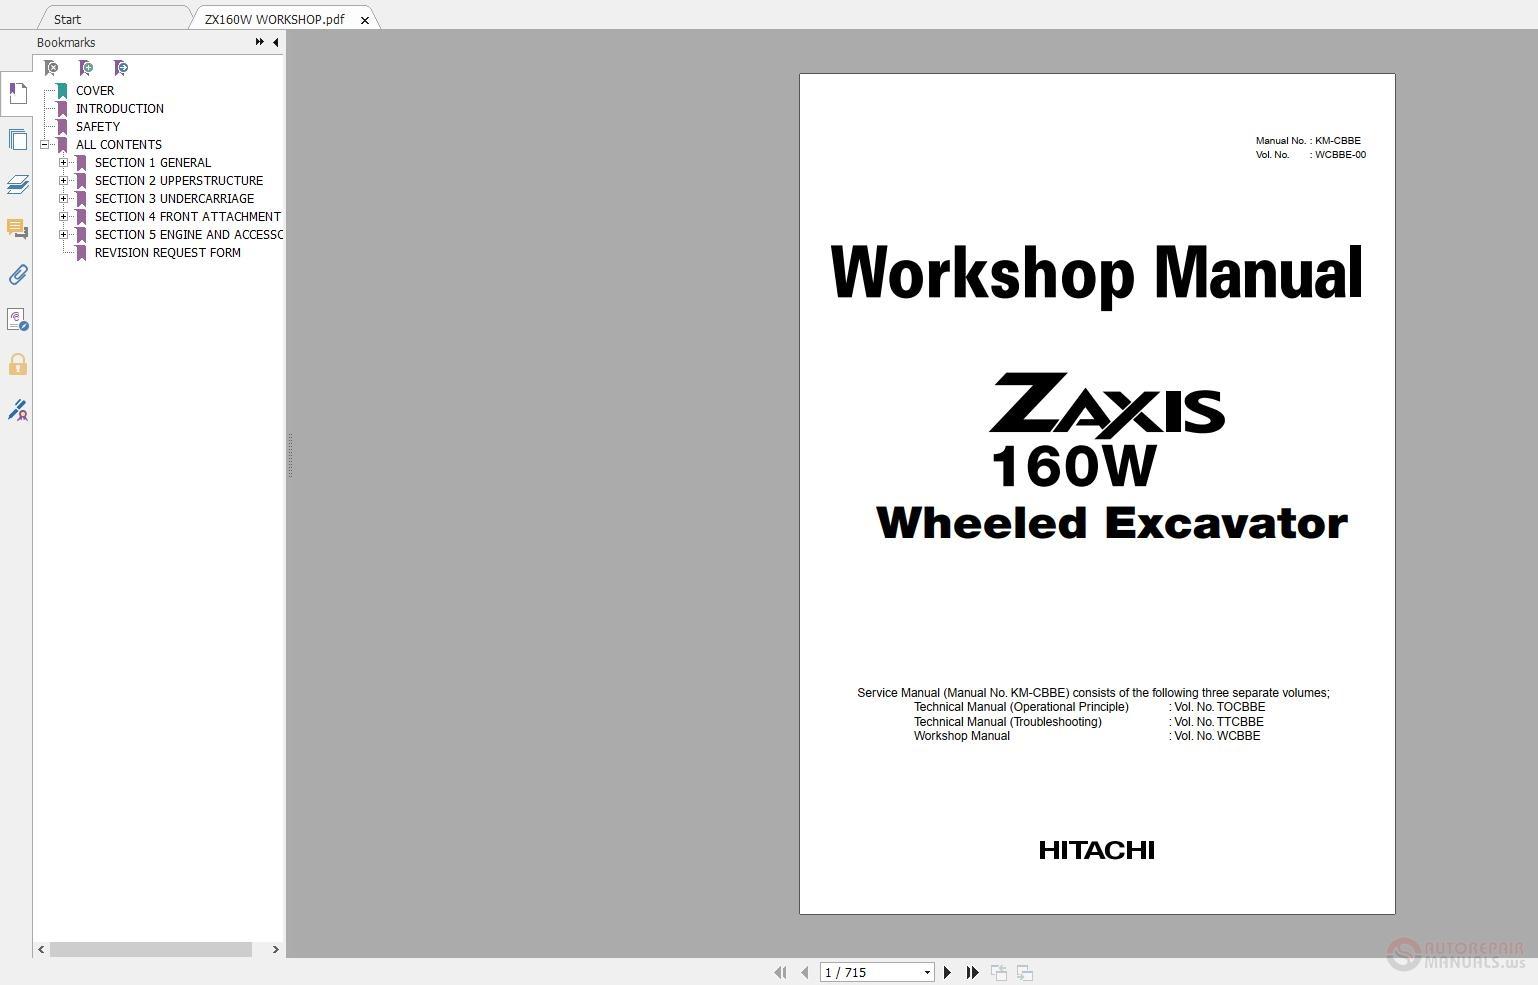 120vac Wiring Diagram Free Download Wiring Diagrams Pictures